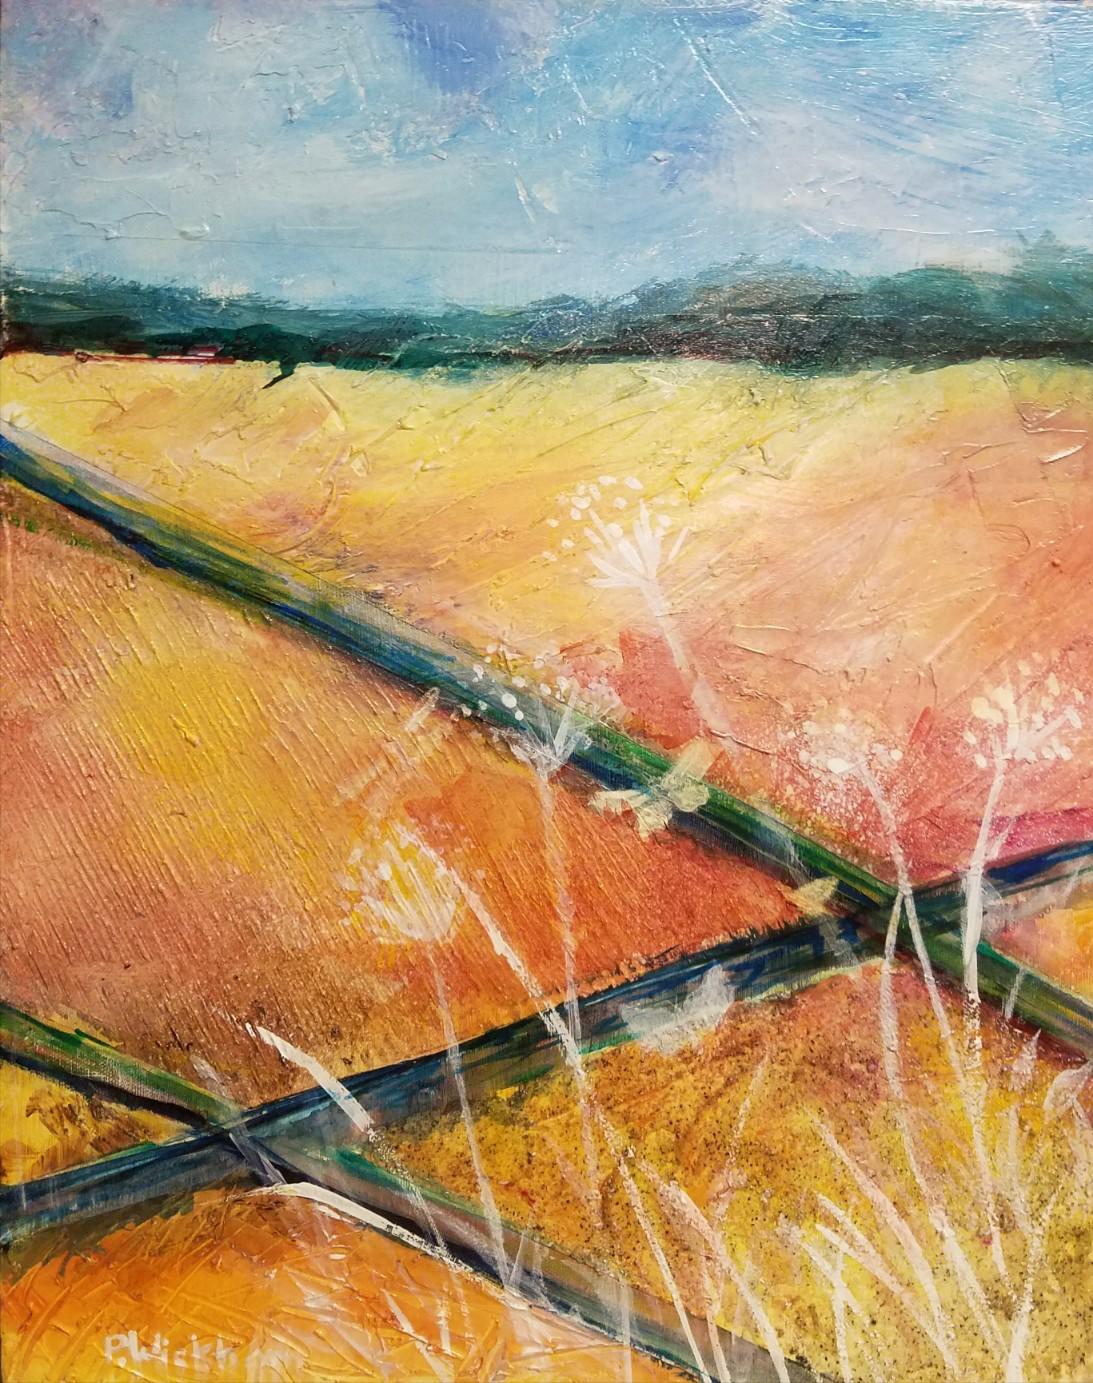 Land of Milk & Honey, Peggy Wickham